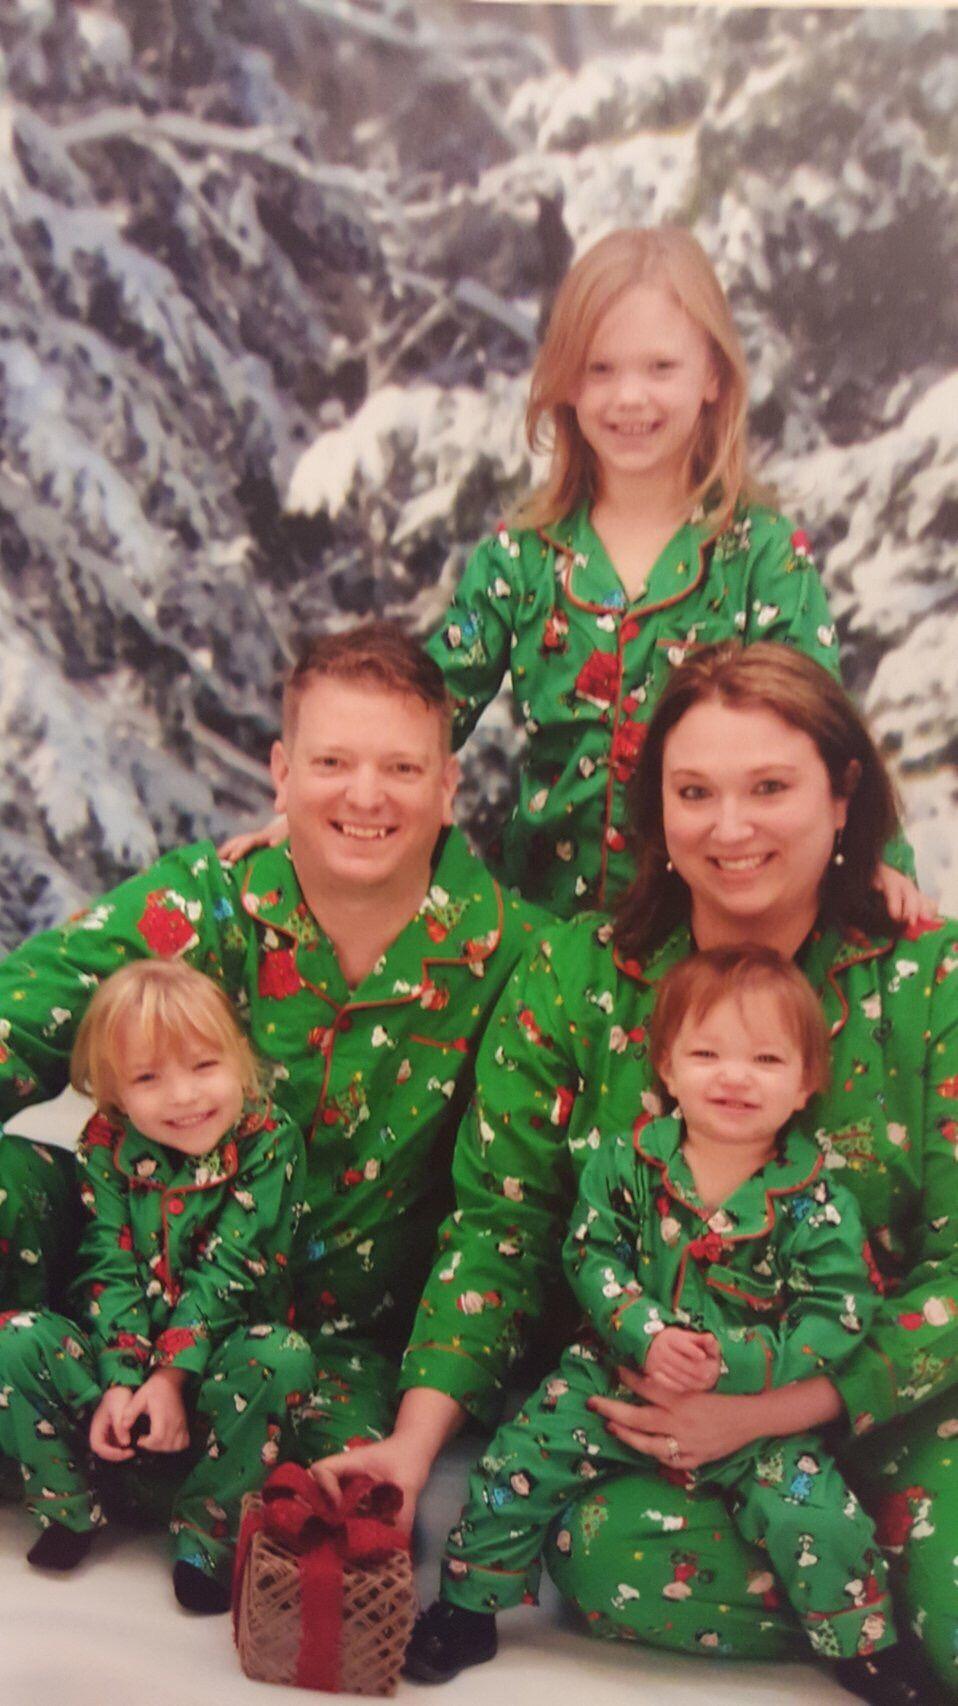 46a61c1a5f Charlie Brown Christmas Matching Family Pajamas | Holiday Matching ...